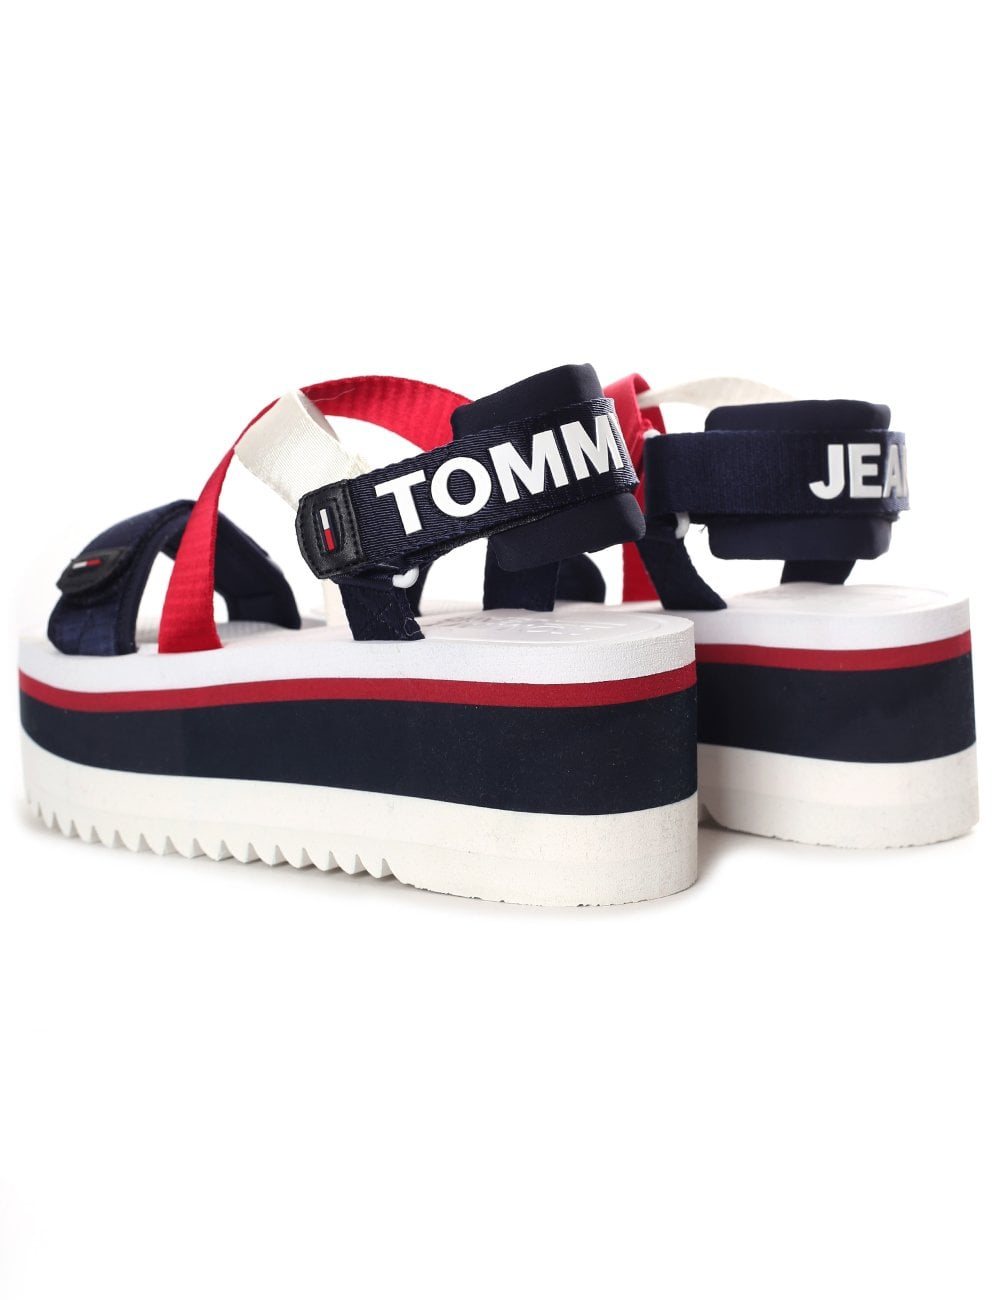 8a6343495c4e Tommy Jeans Women s Sport Neoprene Platform Sandal